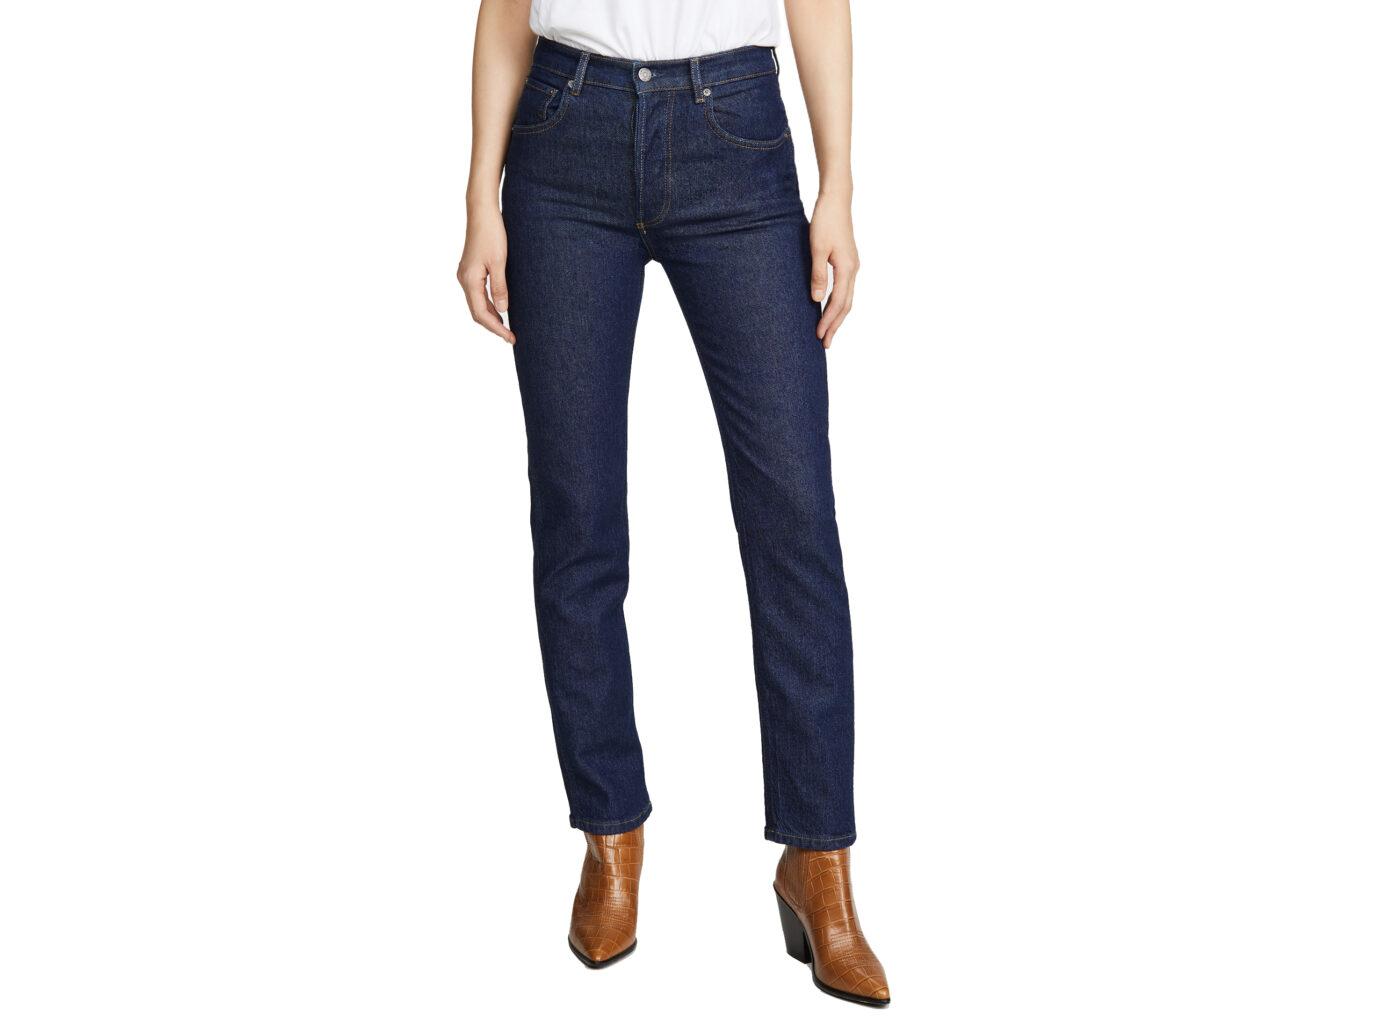 Boyish The Dempsey High-Rise Straight Leg Jeans